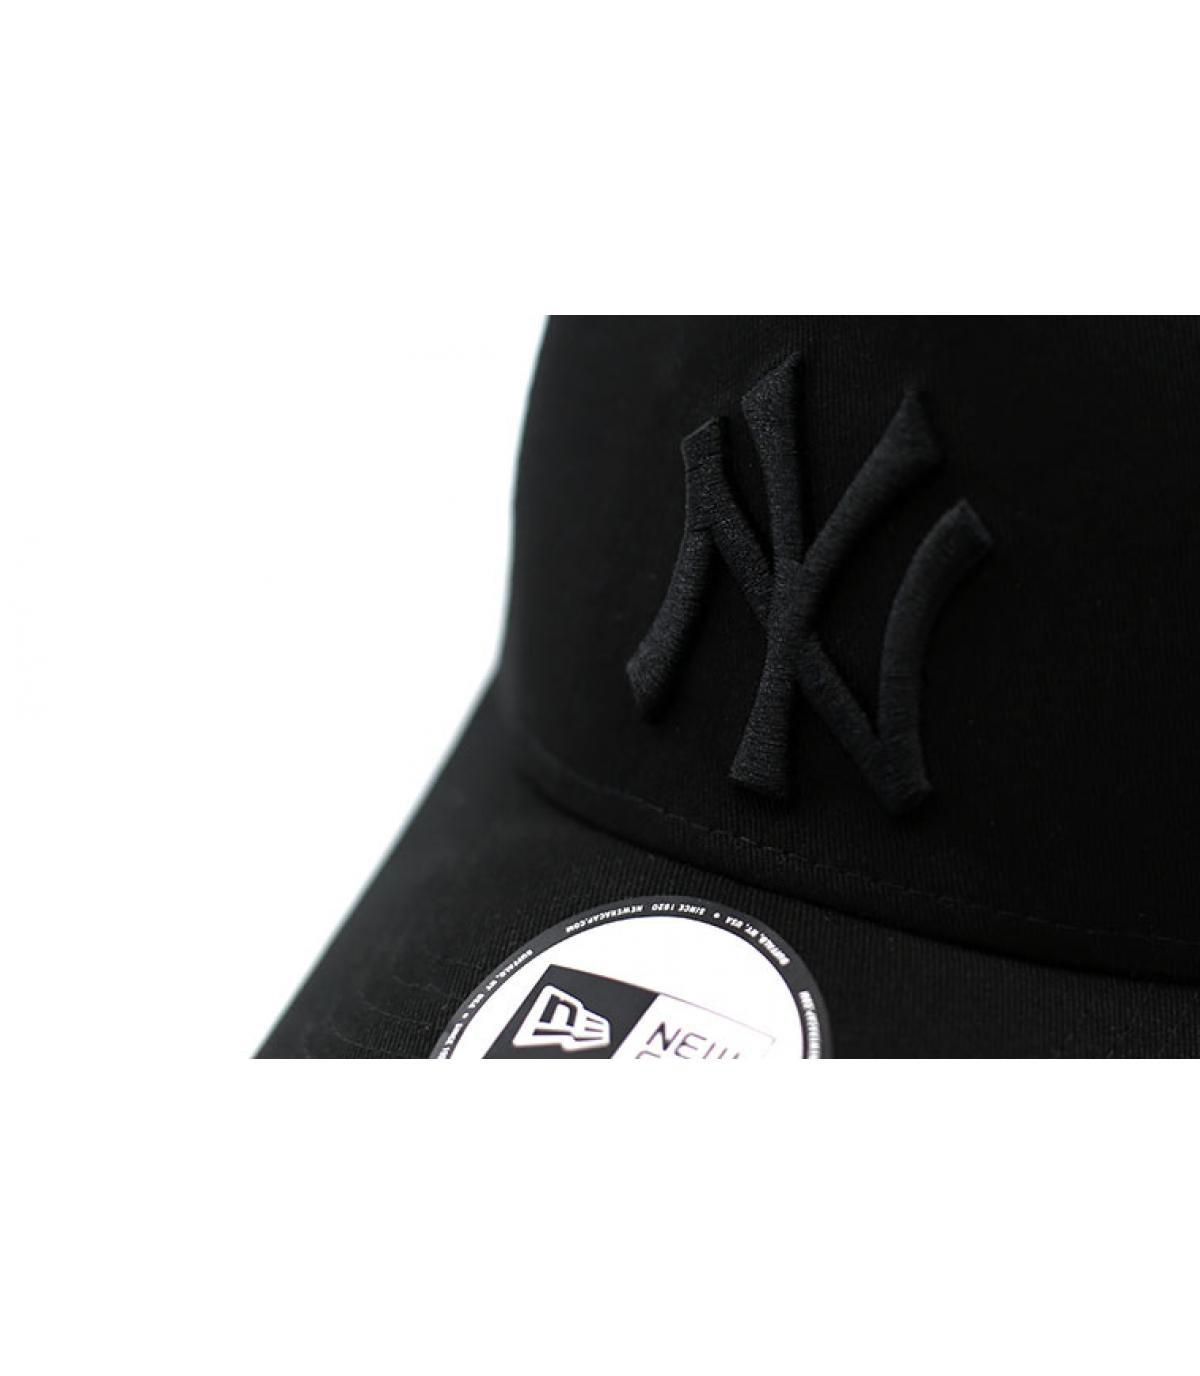 Details Trucker League Ess NY black black - Abbildung 3